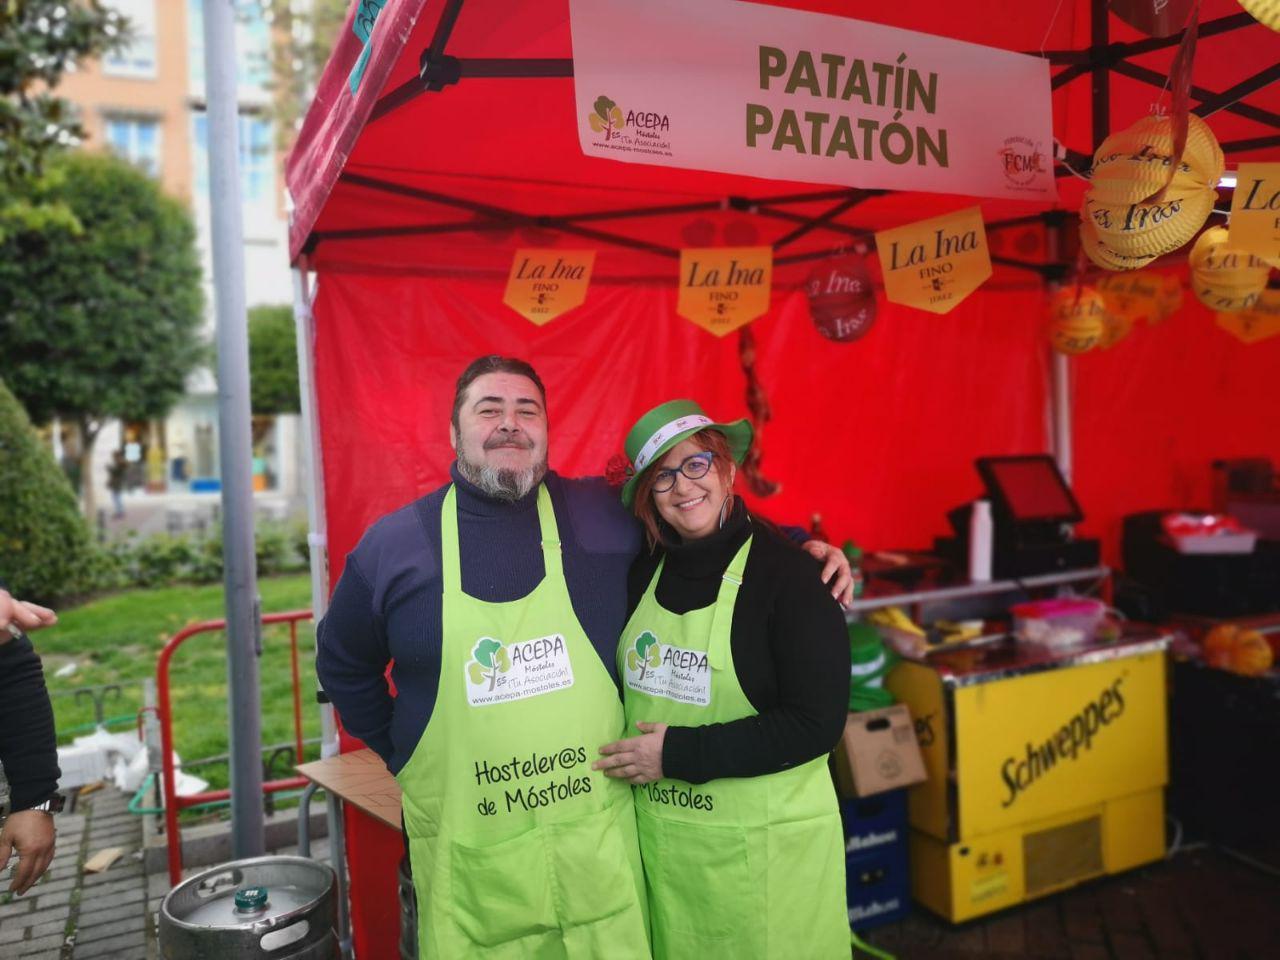 Patatin